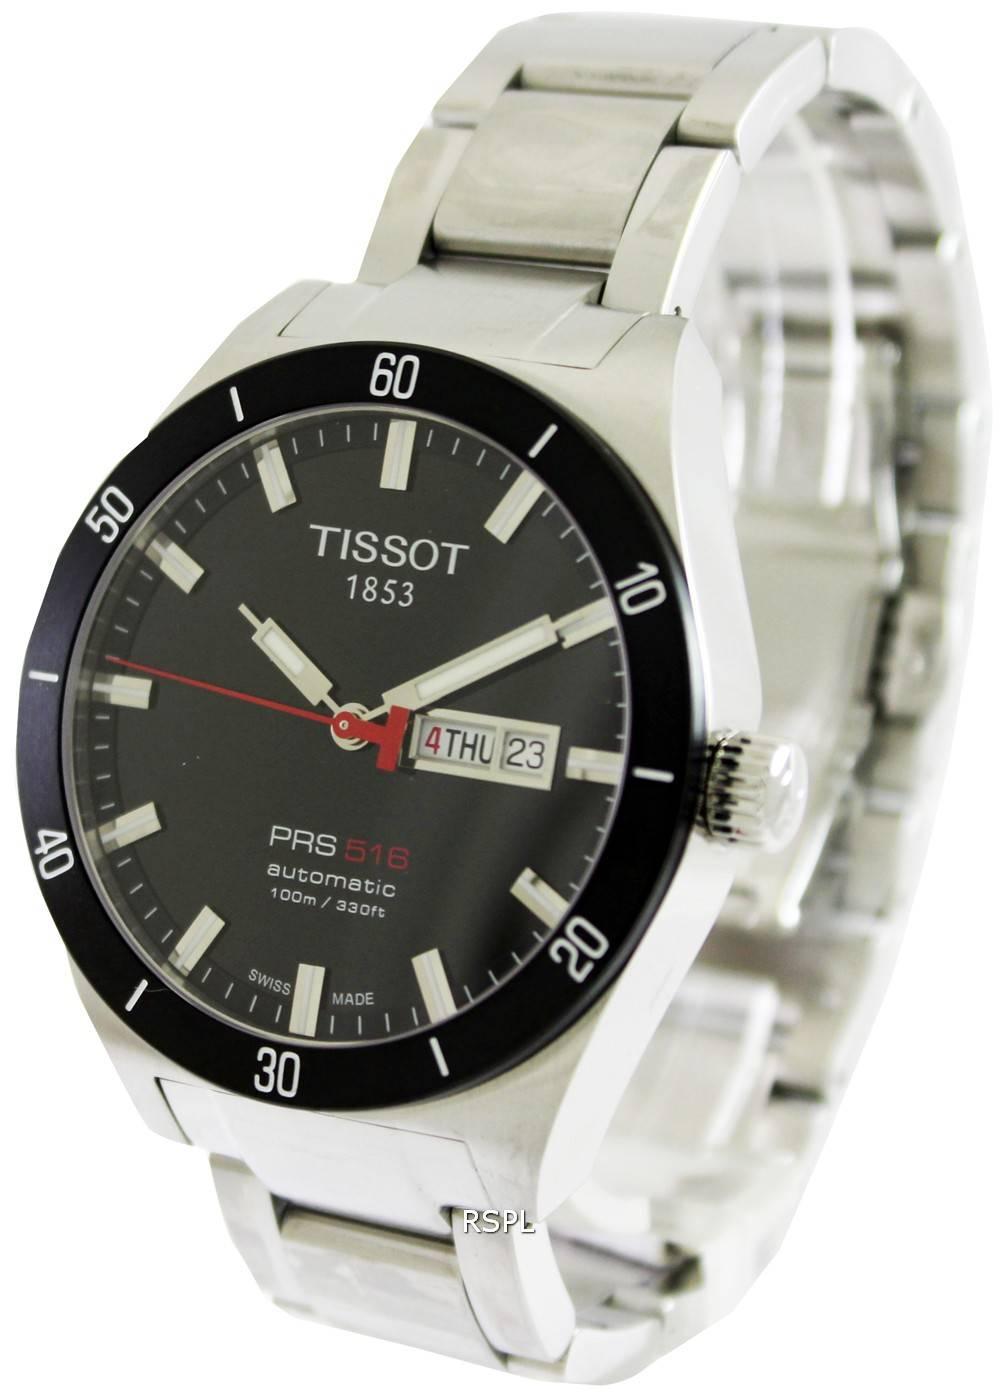 tissot t sport prs 516 automatic watch. Black Bedroom Furniture Sets. Home Design Ideas